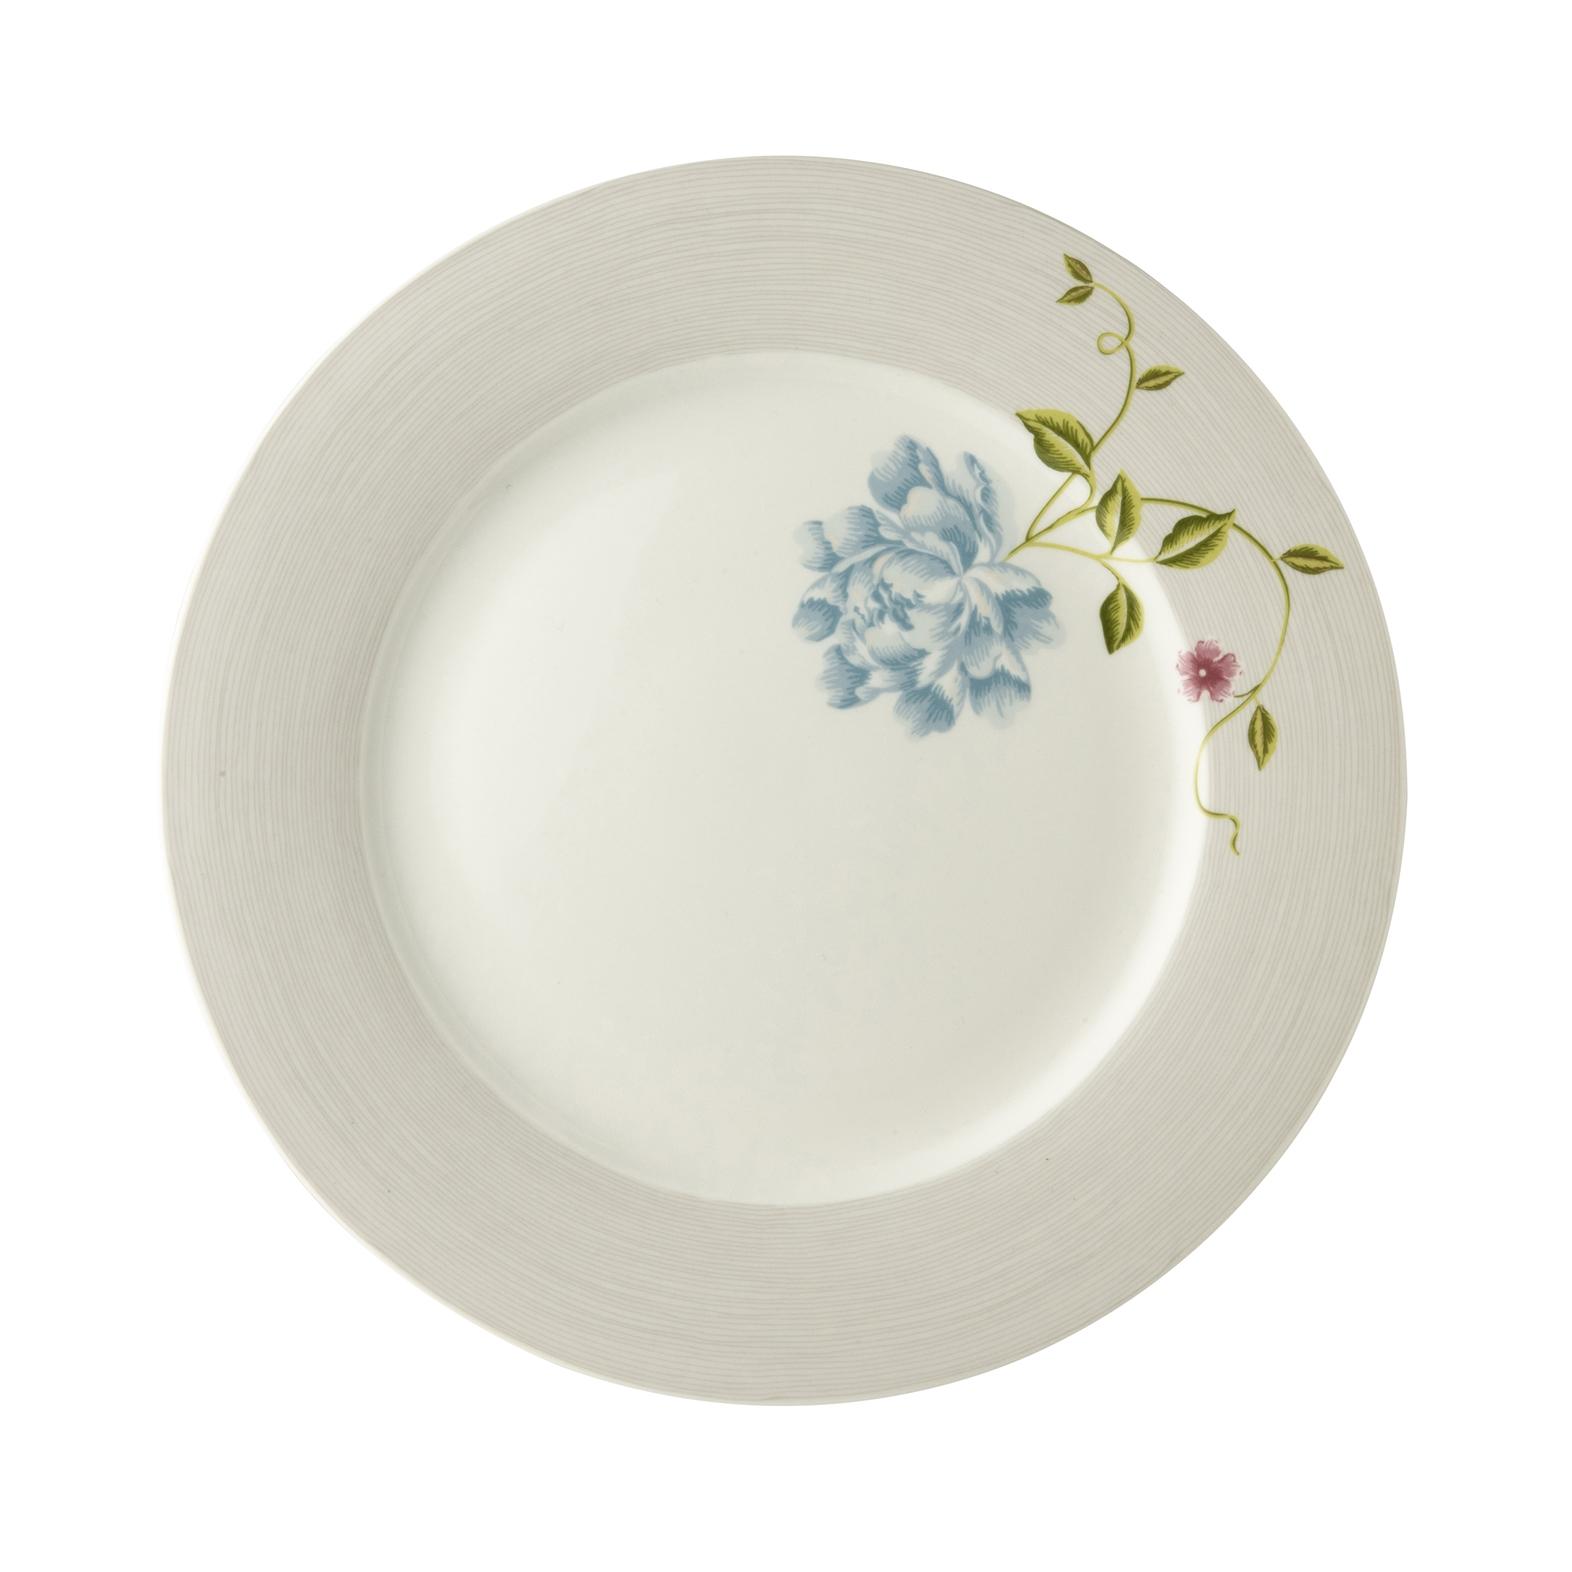 "Онлайн каталог PROMENU: Тарелка основная ""Цветок"" Laura Ashley HERITAGE, диаметр 26 см, серый с цветком                                   180455"